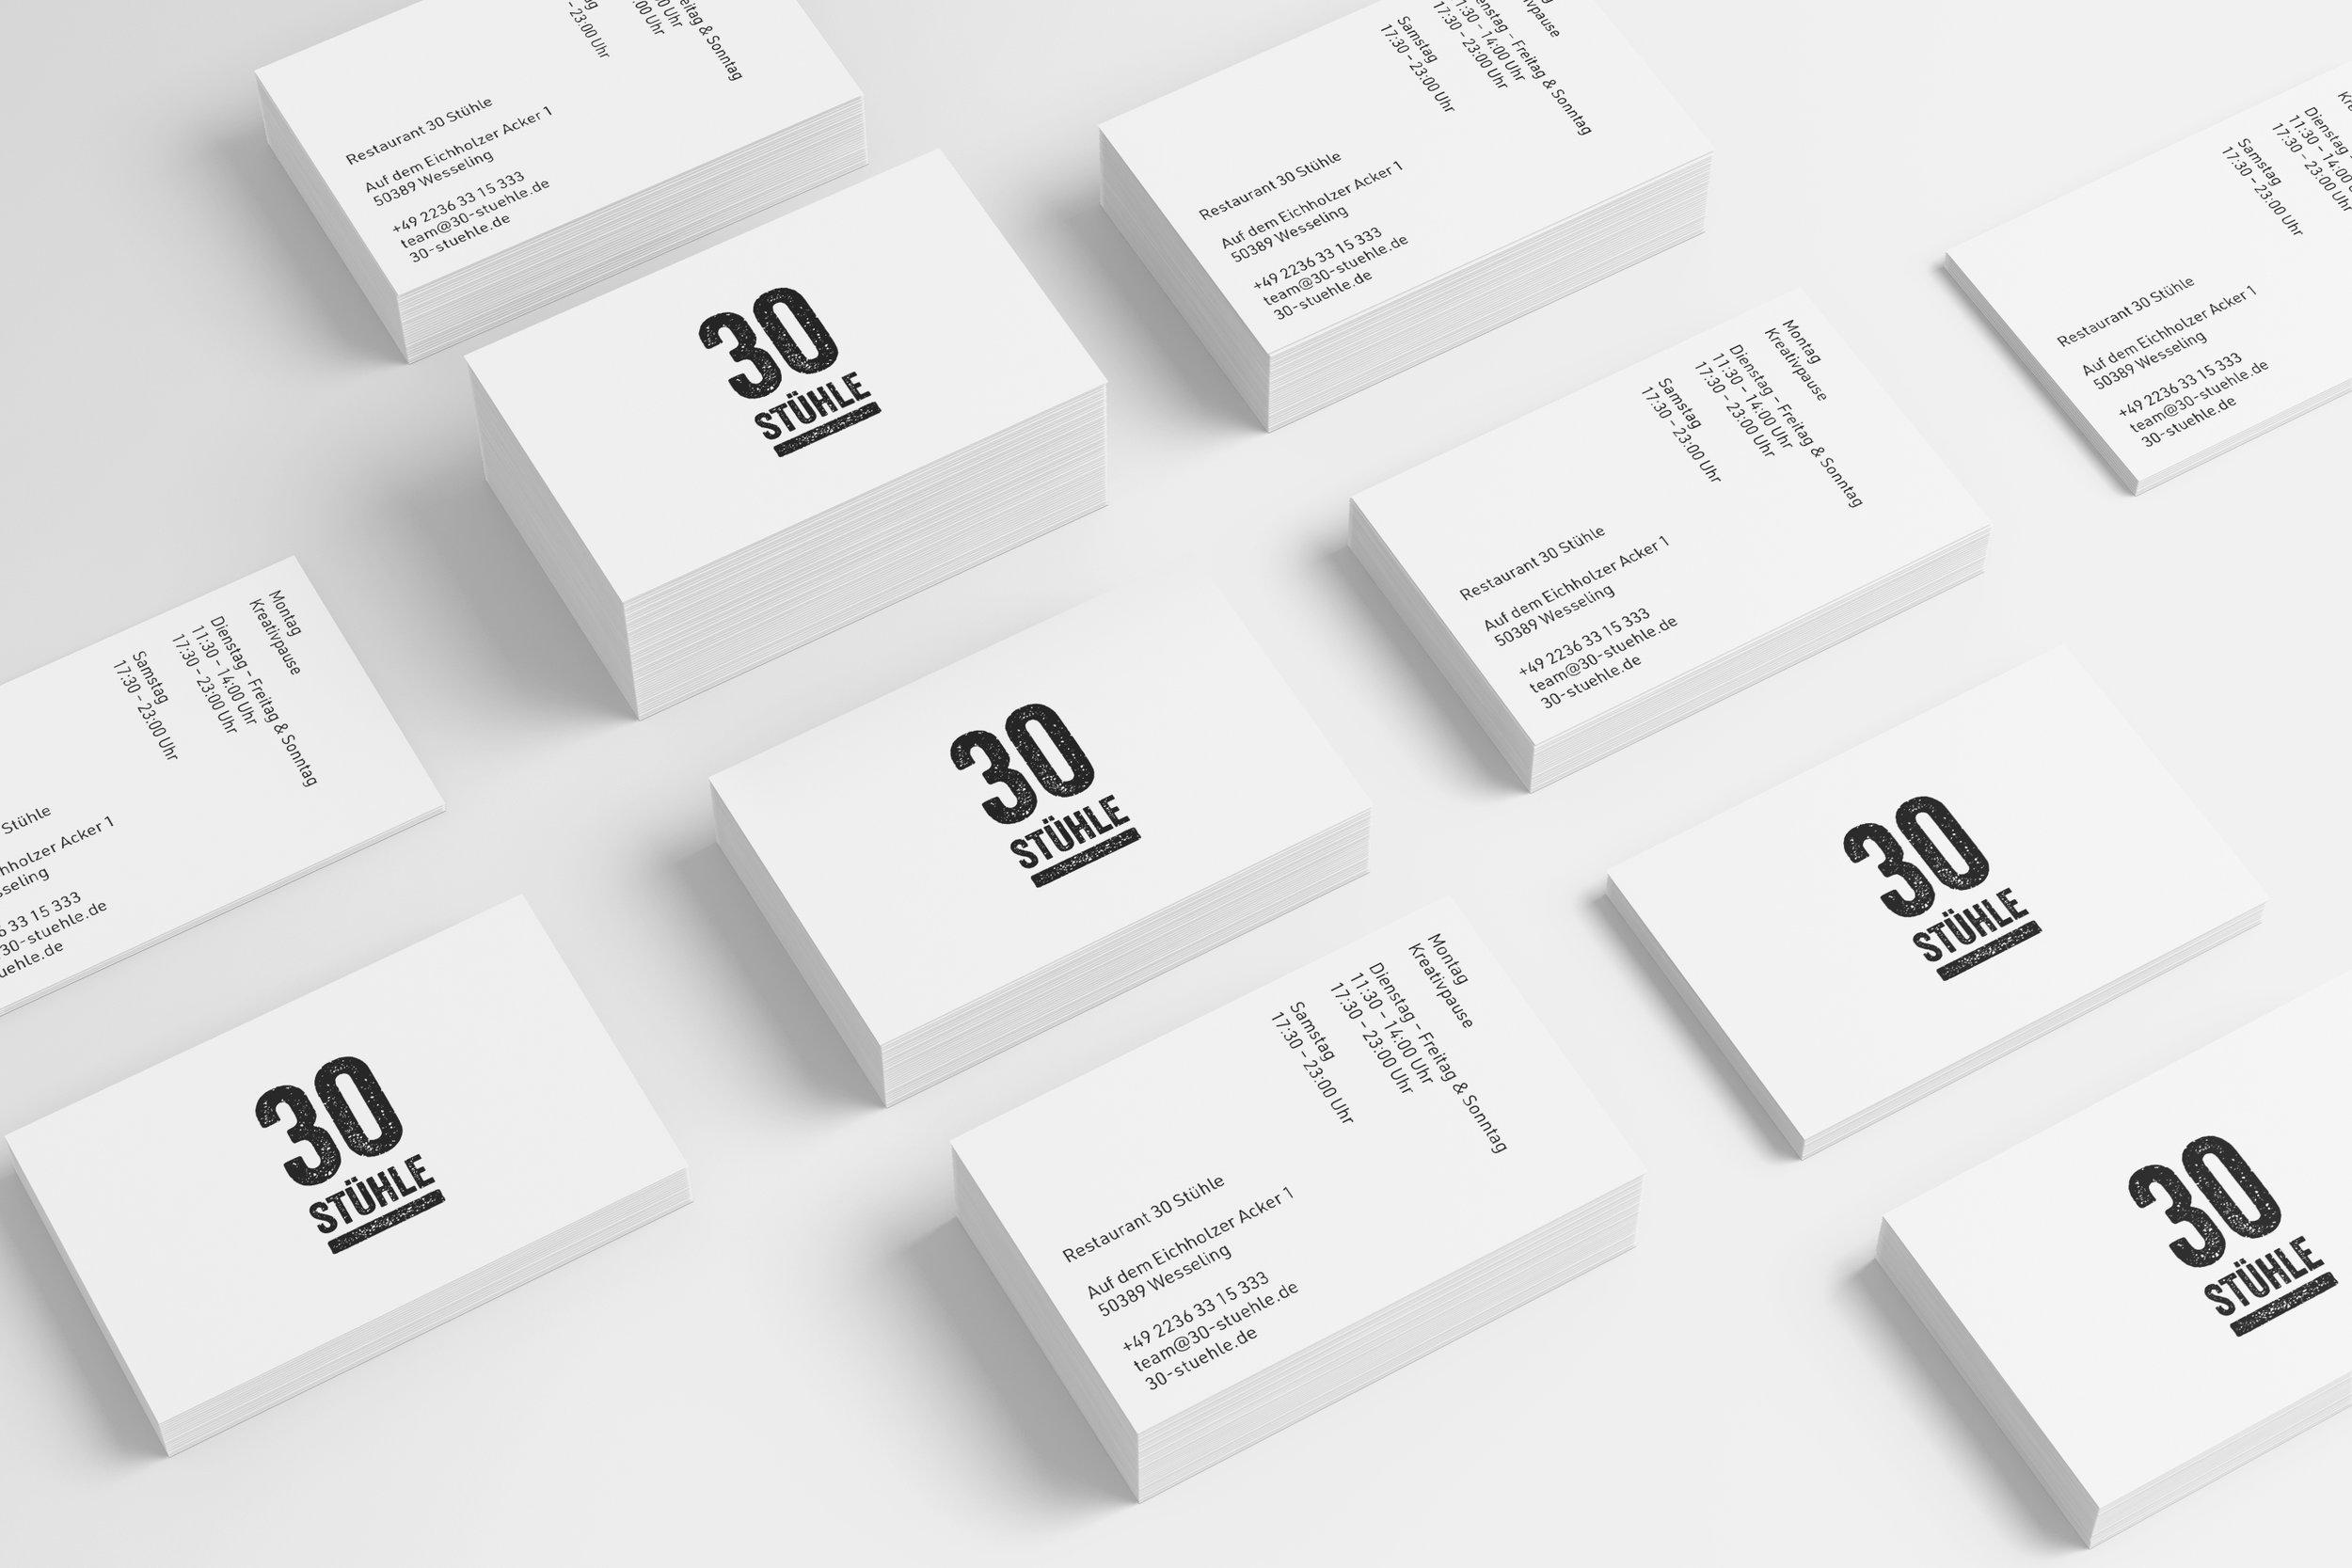 blank-restaurant-30-stuehle-corporate-design-2.jpg